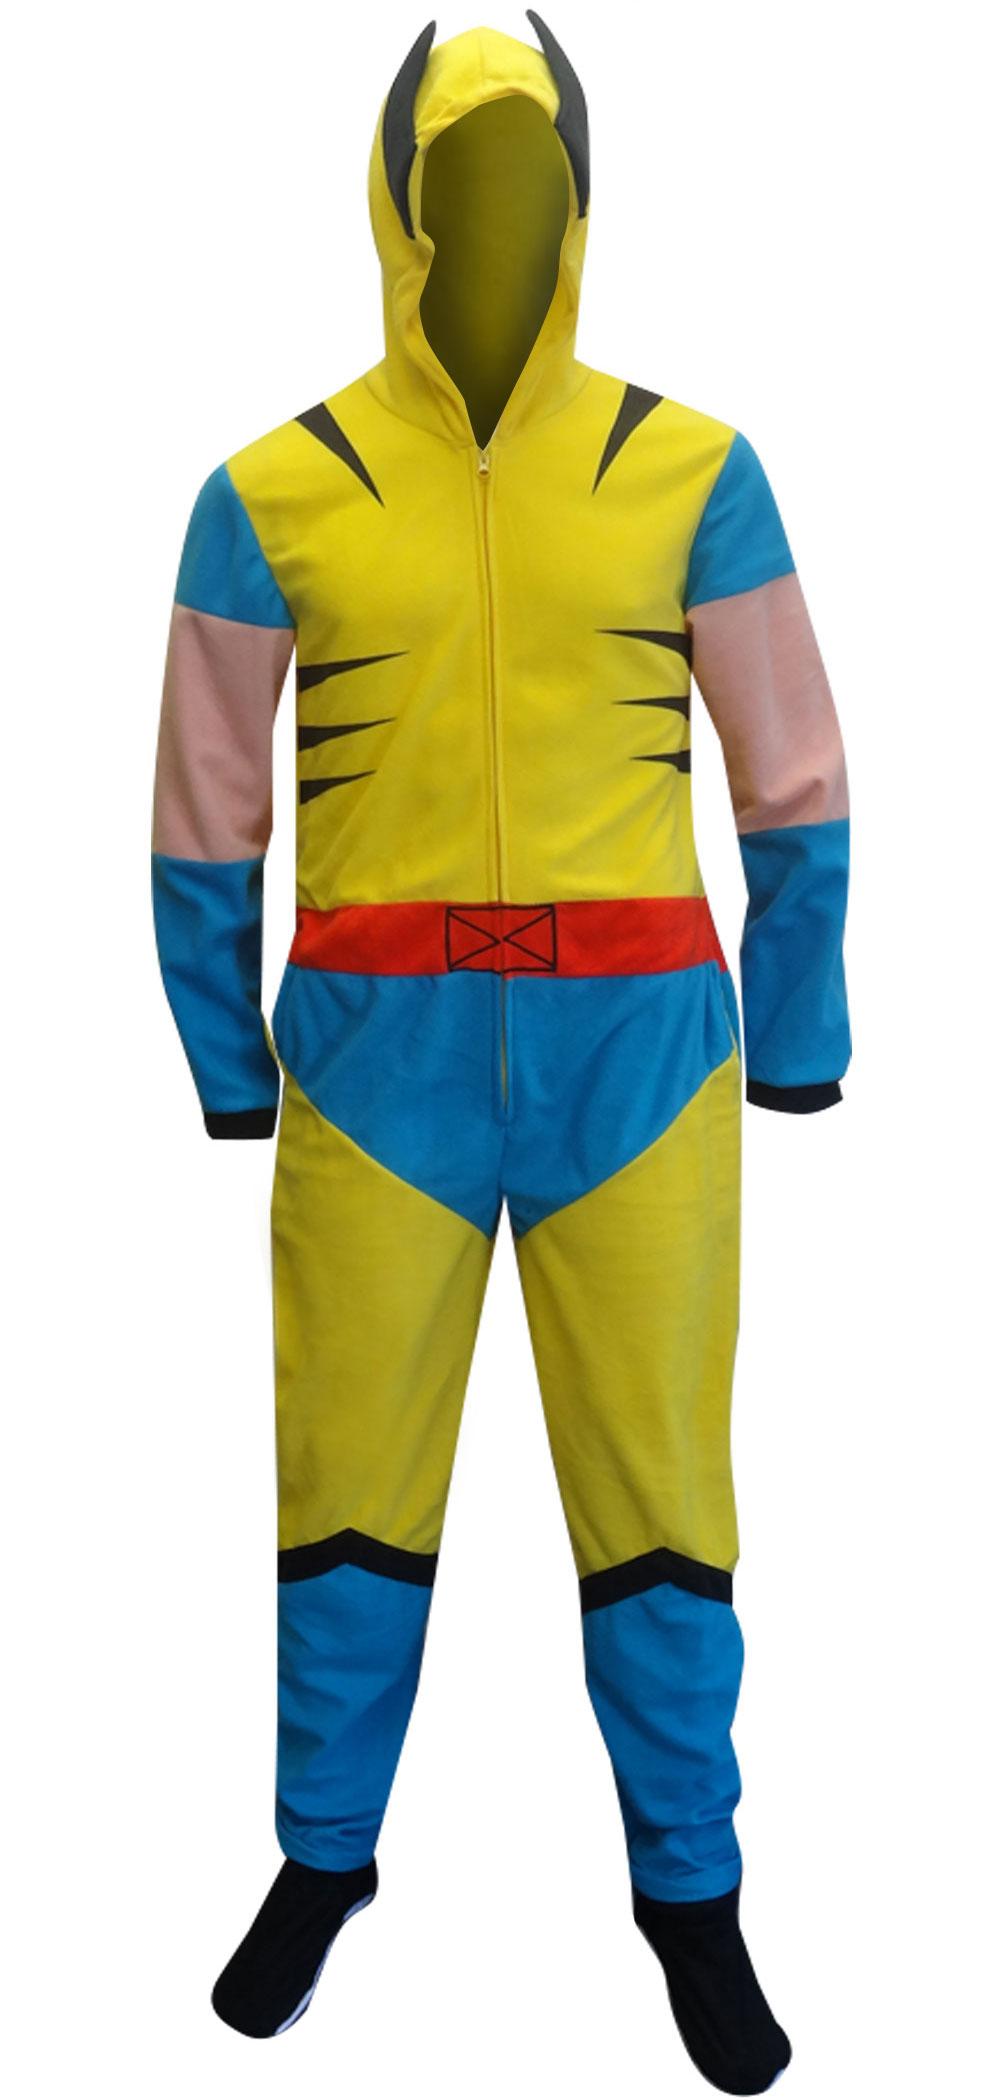 WebUndies.com Marvel Comics Wolverine Hooded Fleece Onesie Pajama